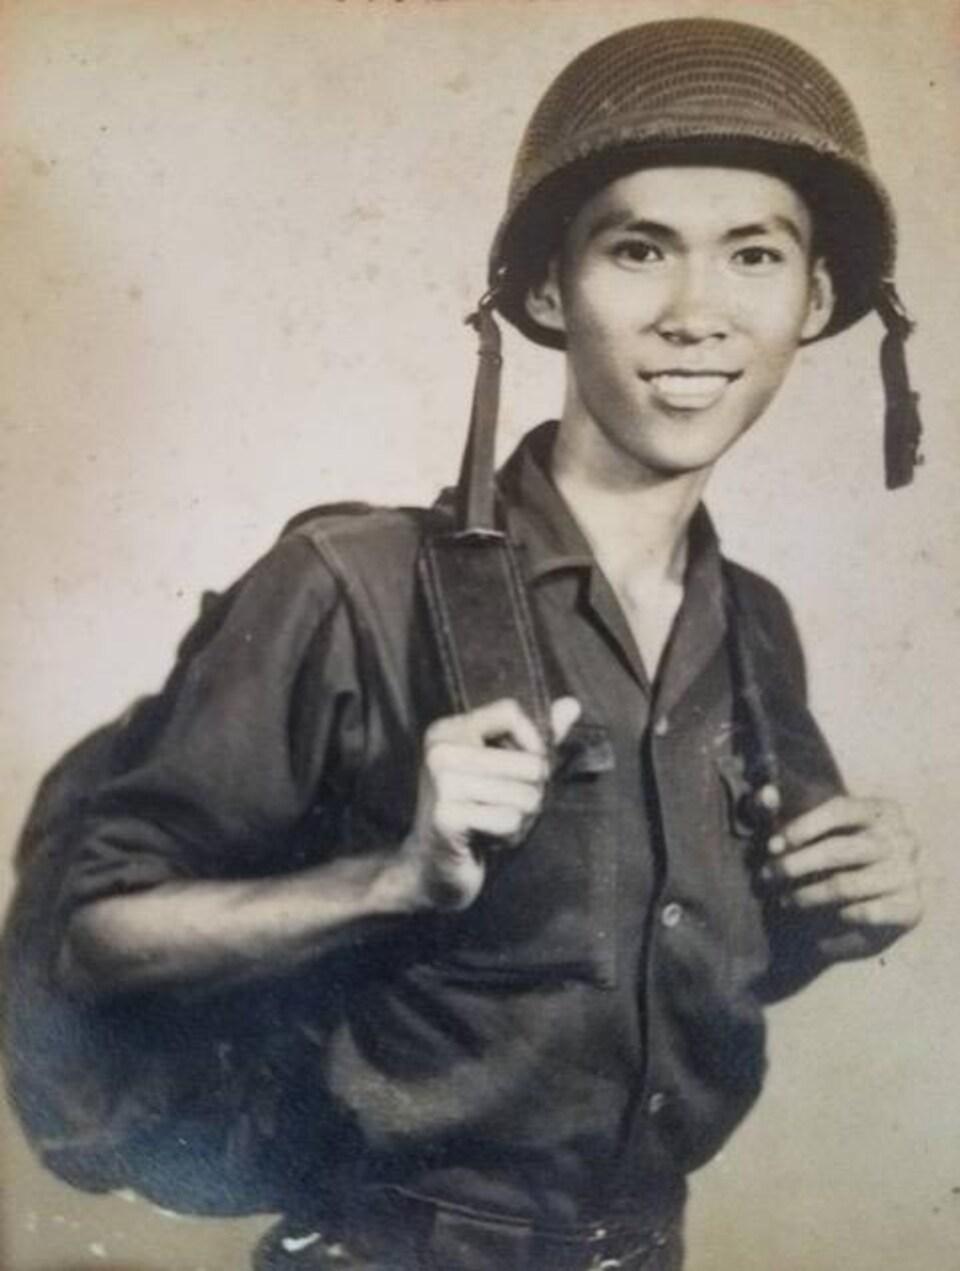 Truong Chanh Trung lors de son service militaire